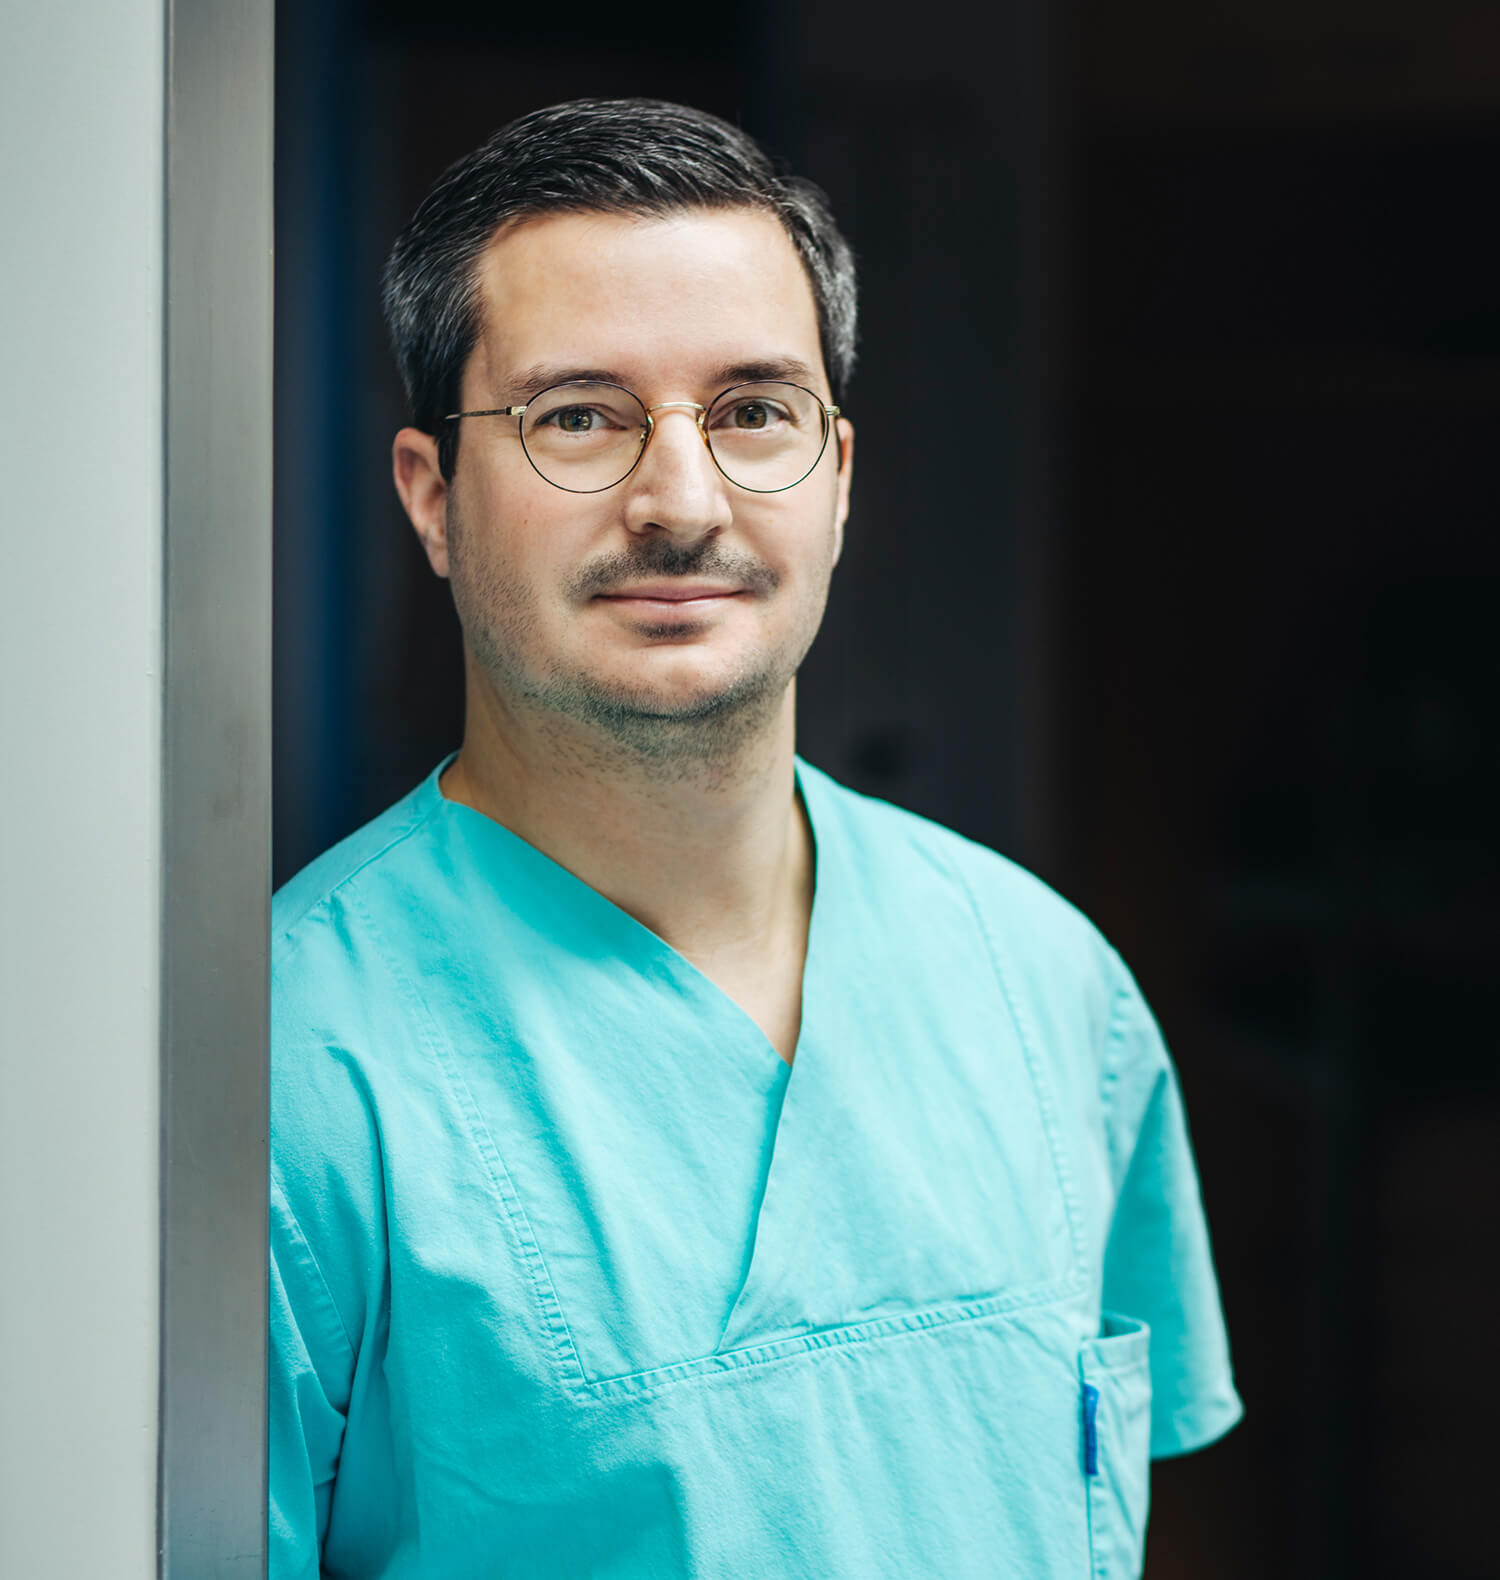 Dr. Figl